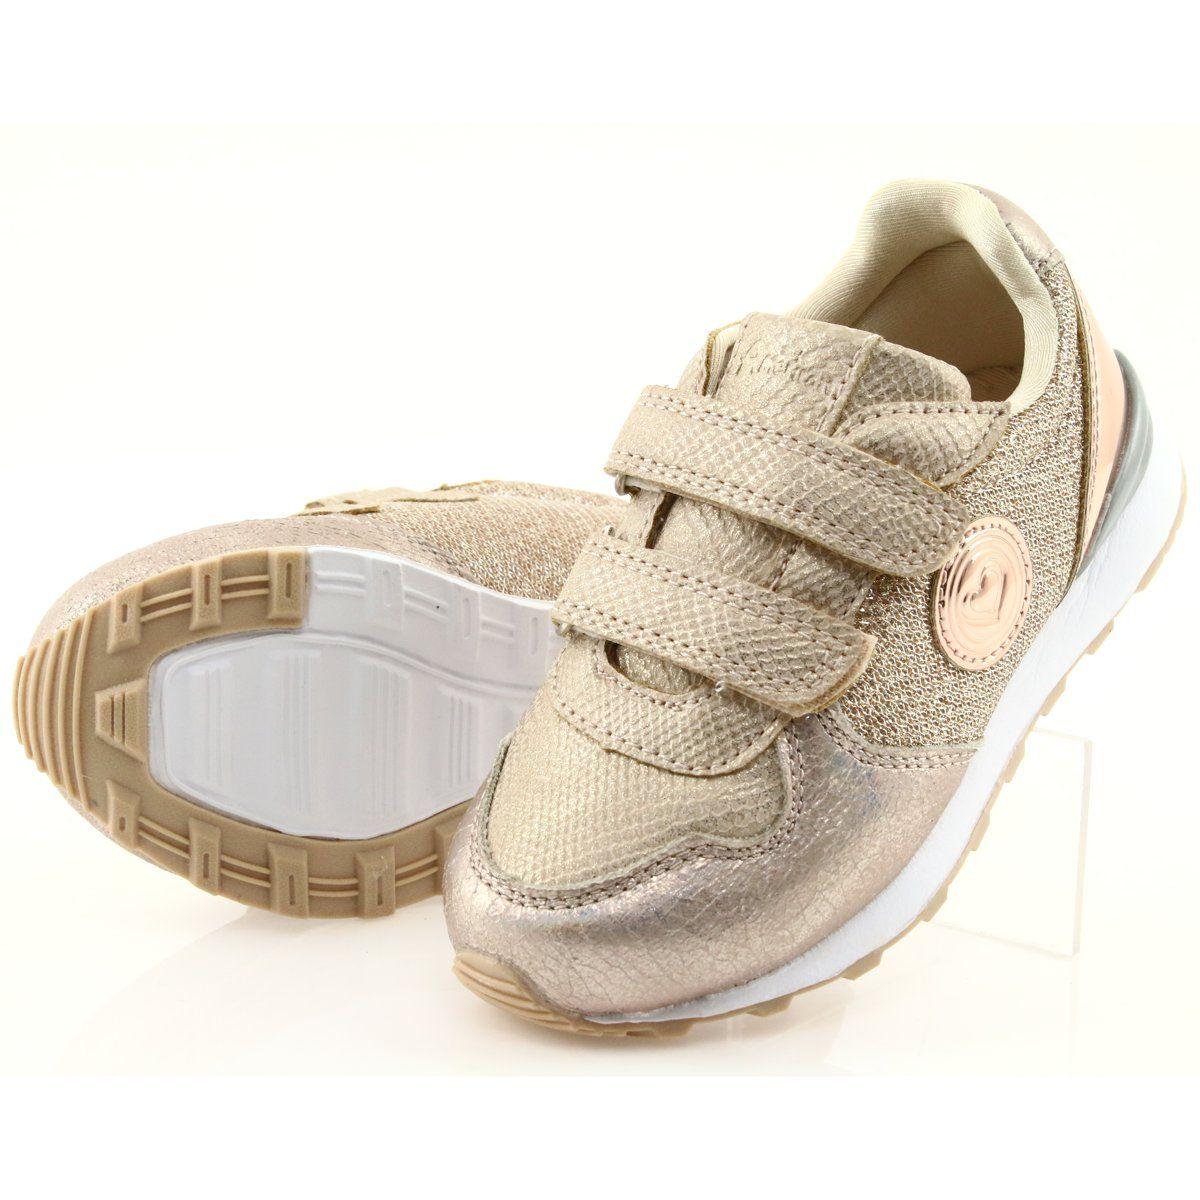 Zlote Buty Sportowe American Club Es26 Zloty Sports Shoes Sports Footwear Kid Shoes